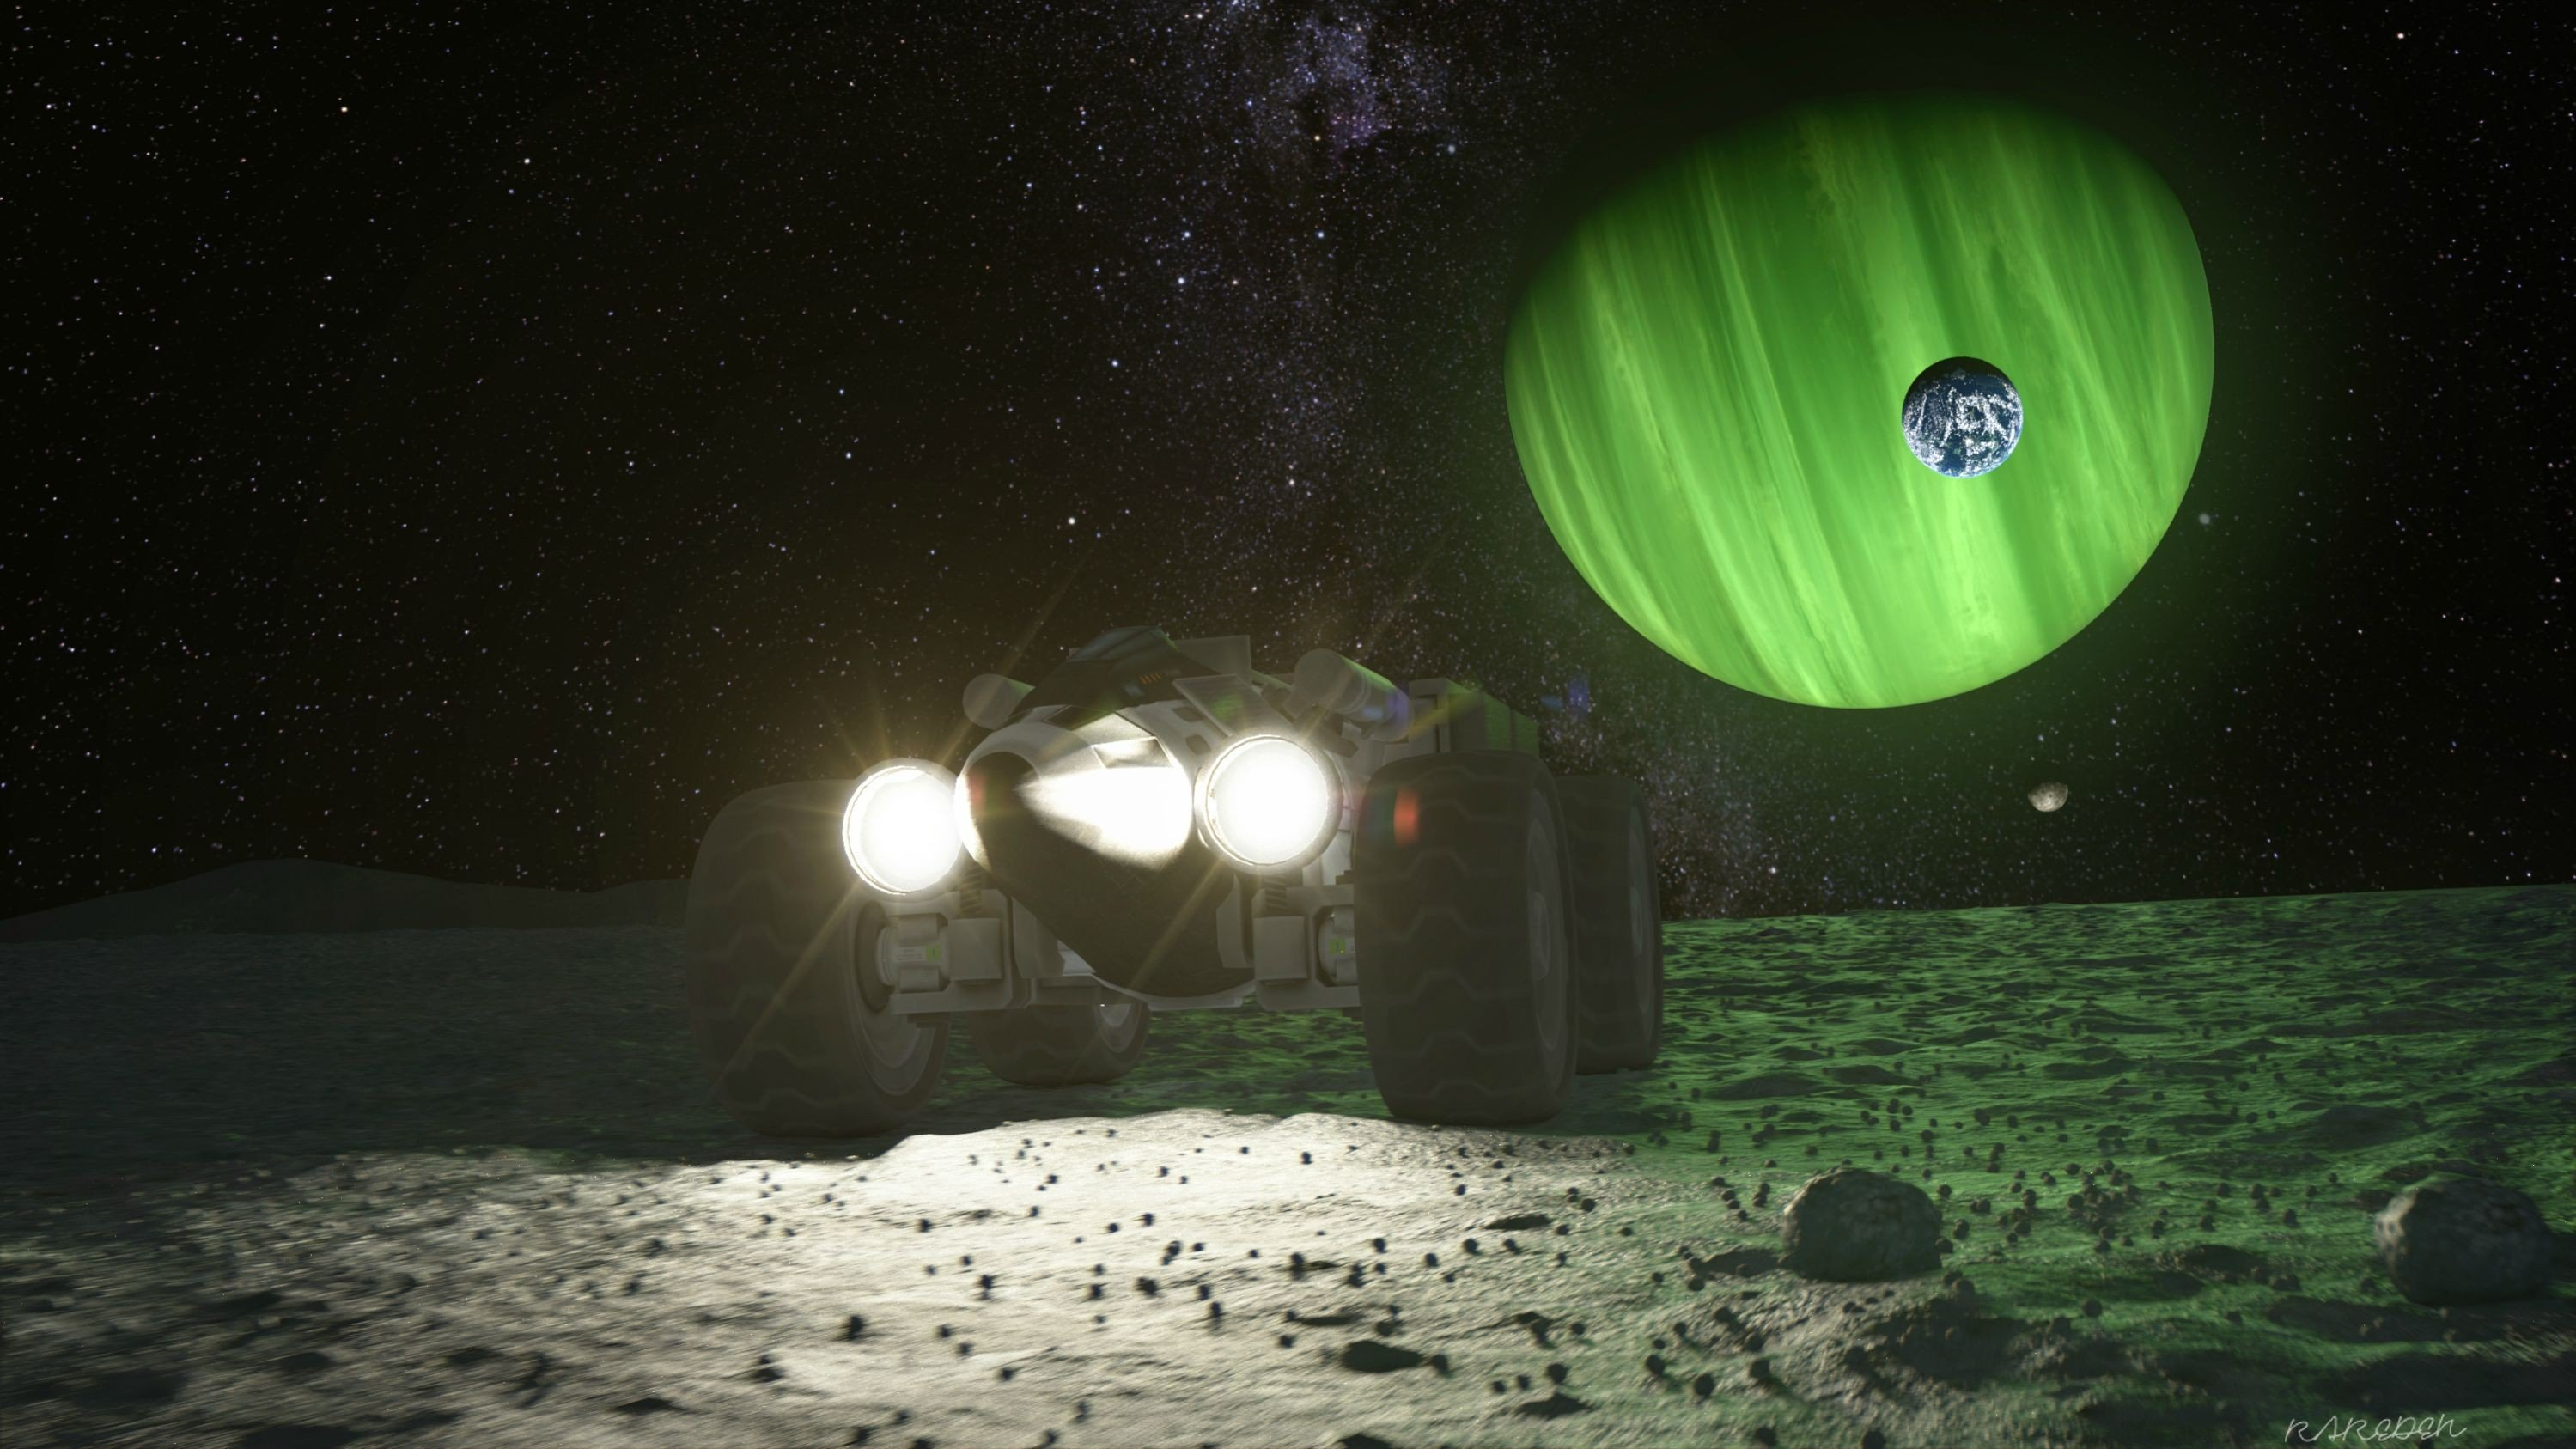 Kerbal space program mun mun rover rover hd wallpapers - Wallpaper kerbal space program ...